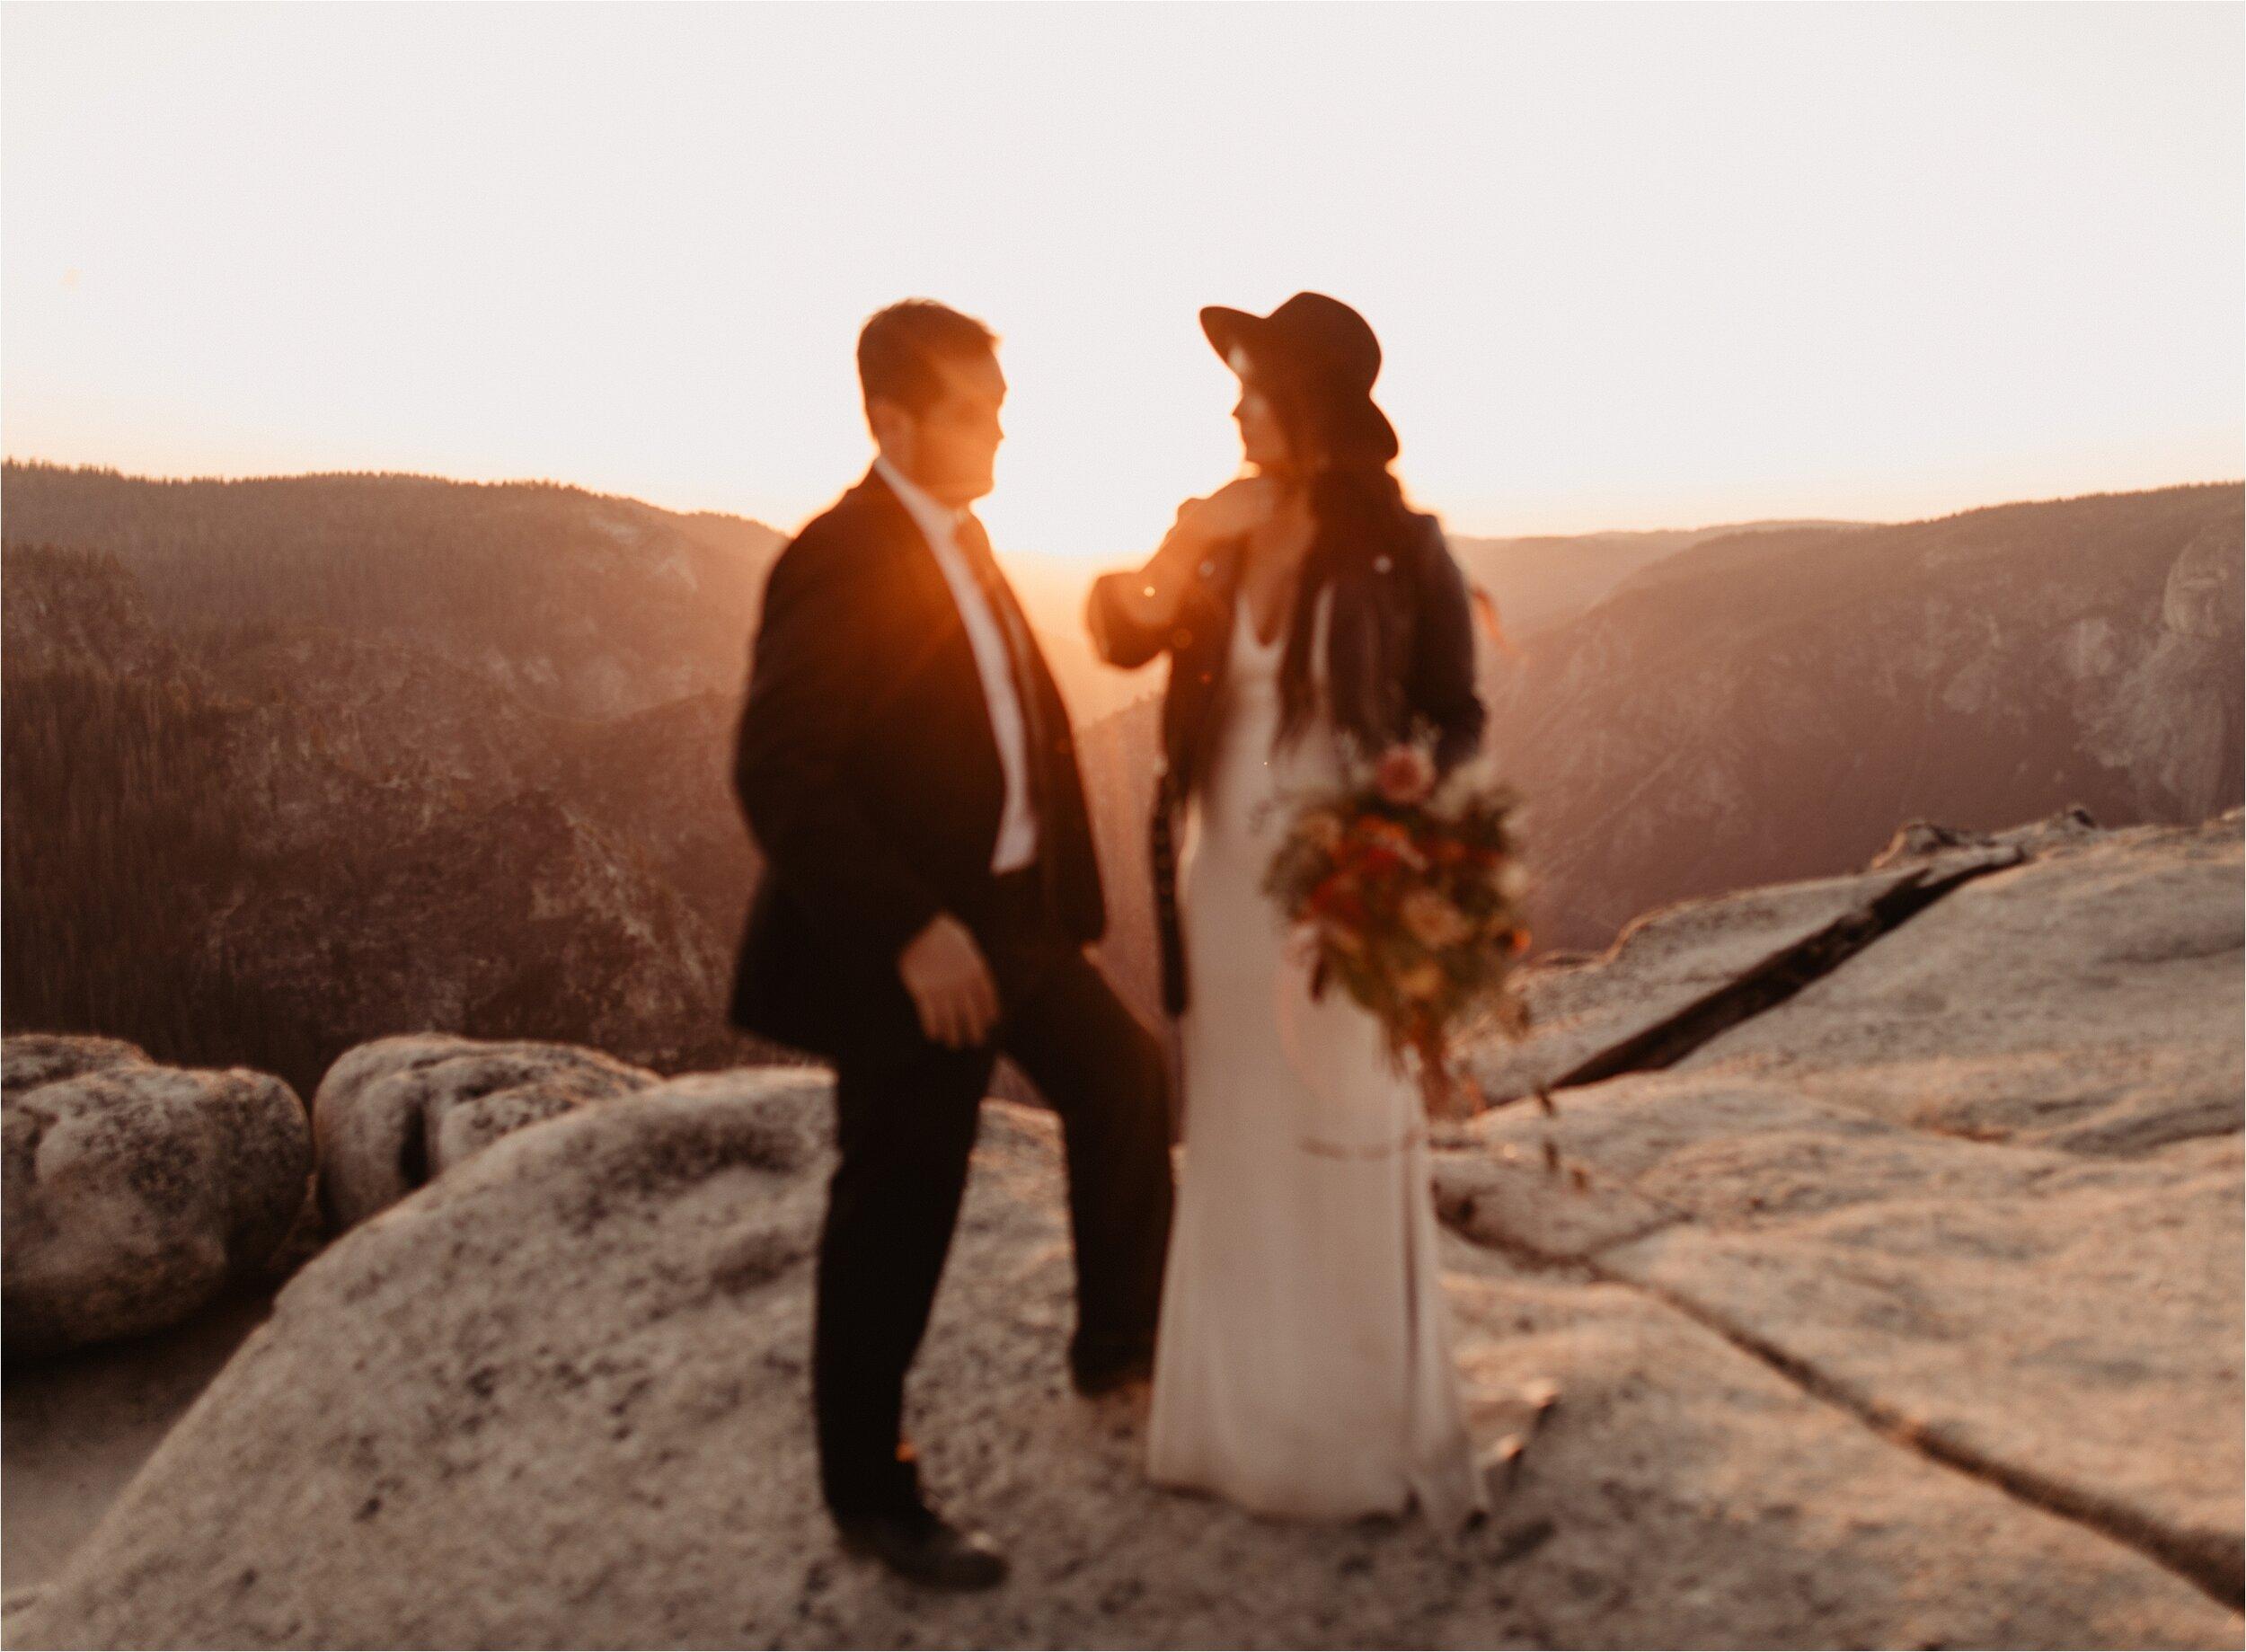 glacier-point-yosemite-elopement-ceremony_0067.jpg